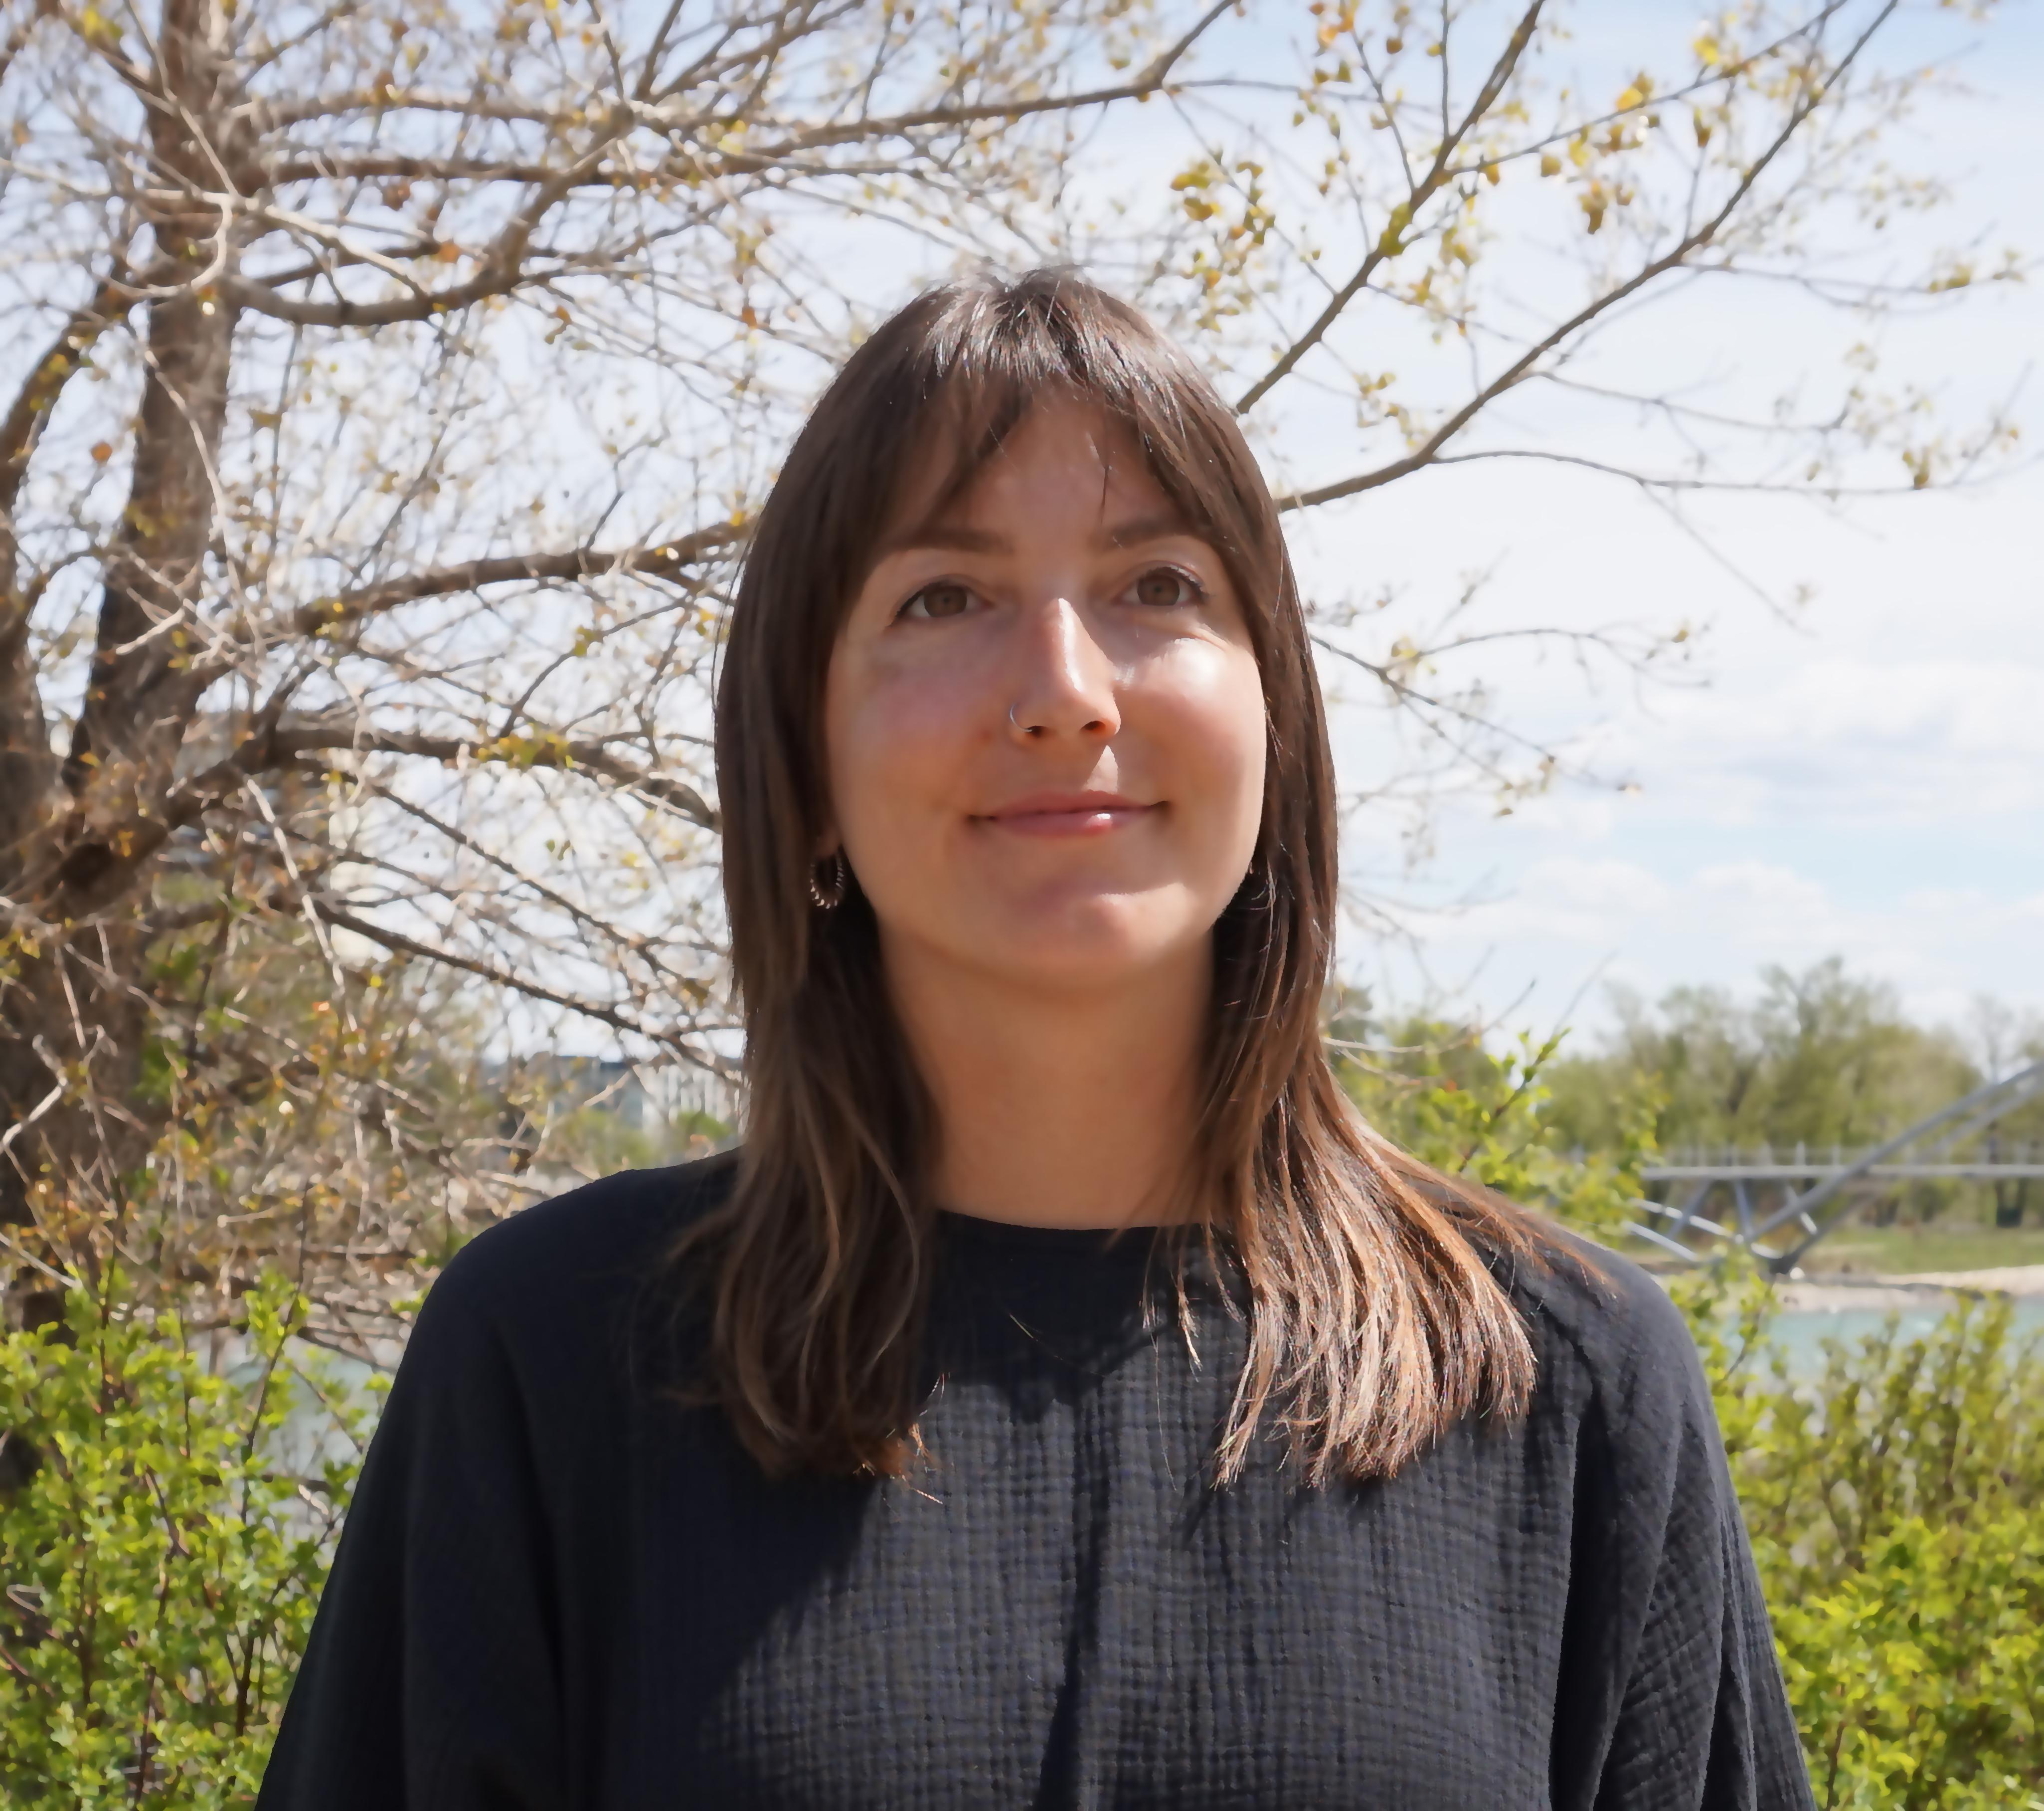 Samantha Grabinsky